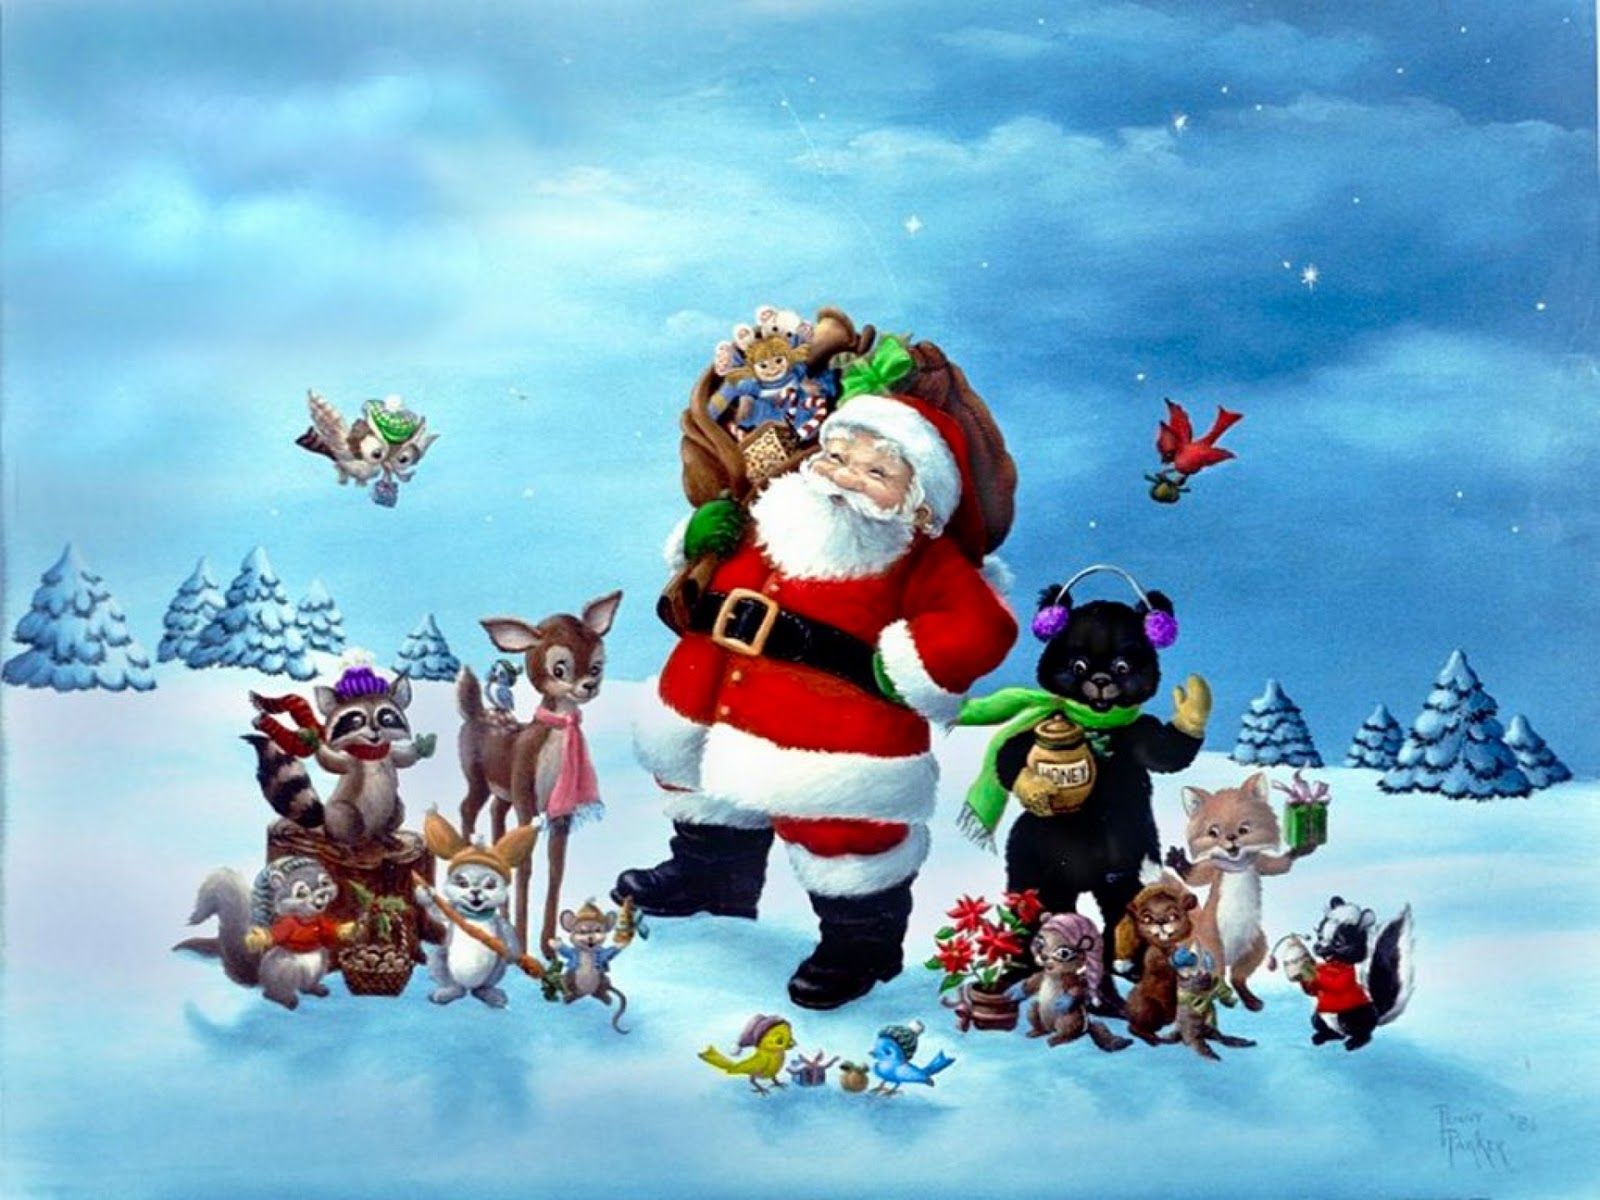 funny christmas wallpaper backgrounds - Funny Christmas Wallpaper